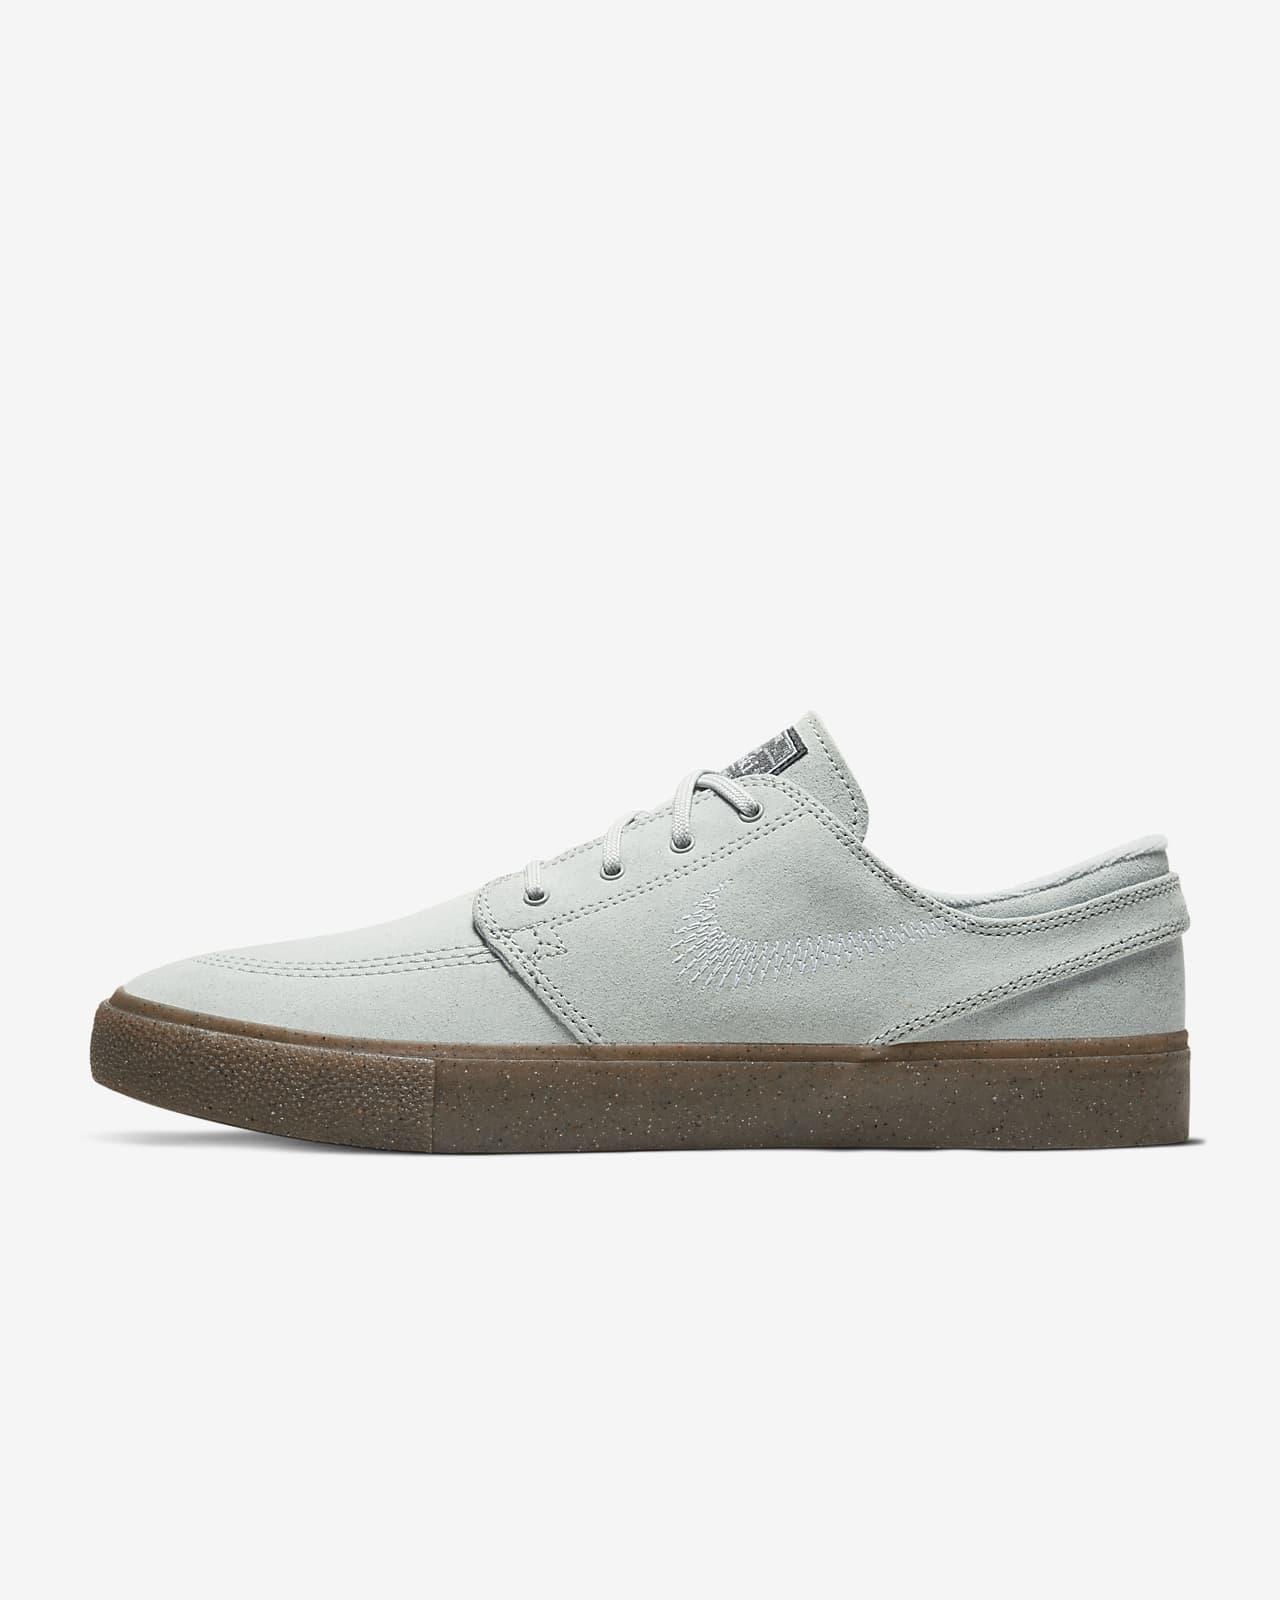 Nike SB Zoom Stefan Janoski FL RM 滑板鞋